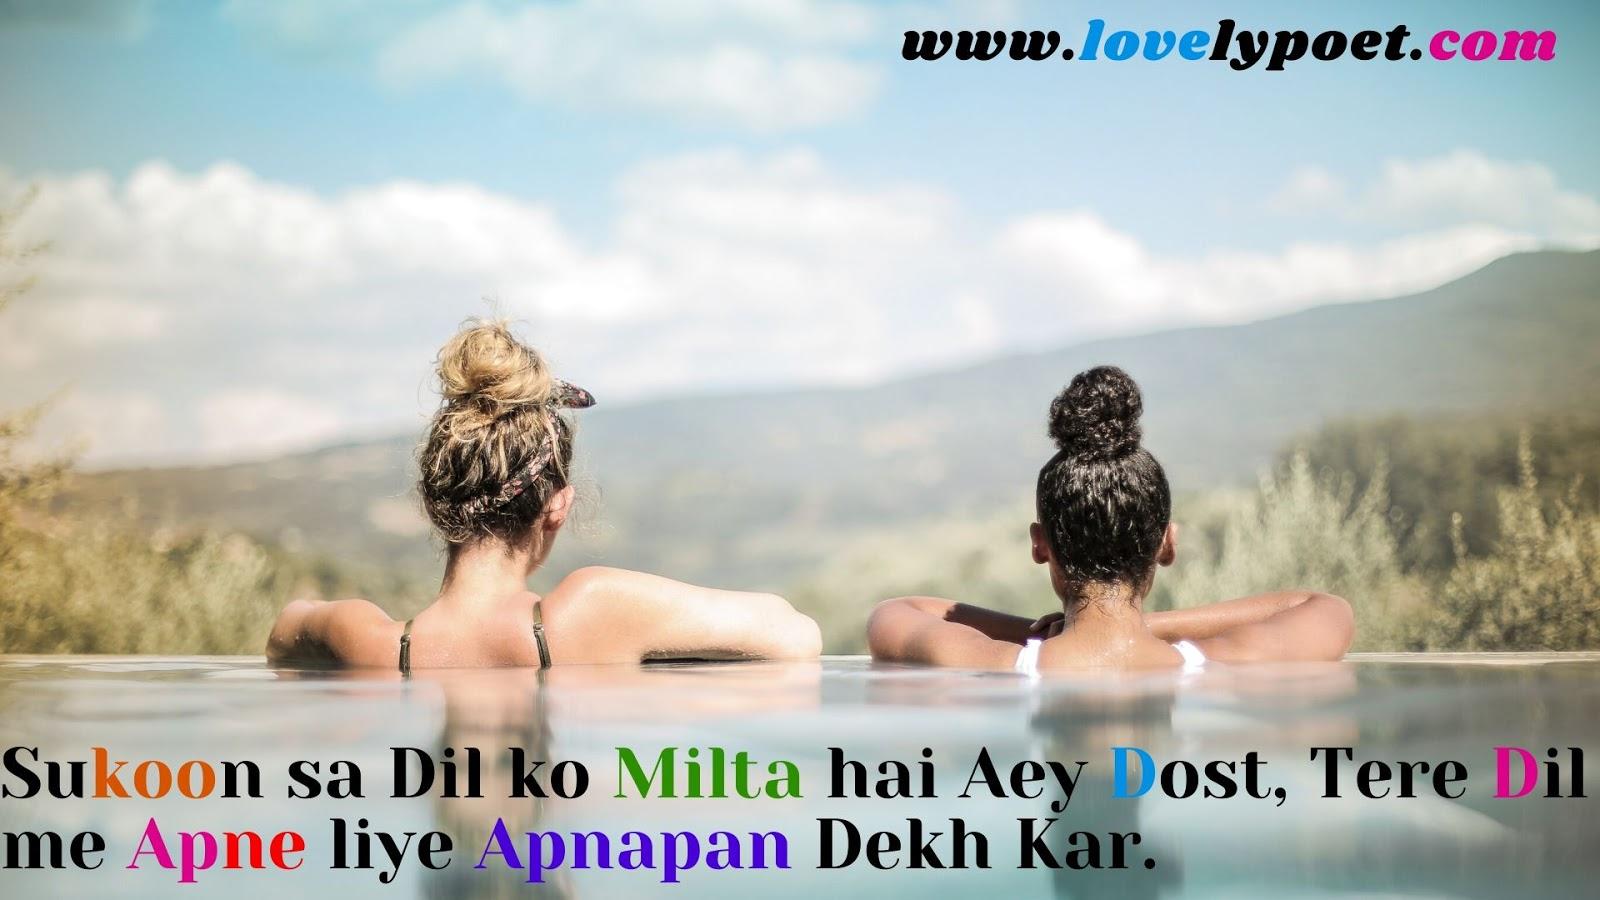 Friendship-shayari-in-hindi